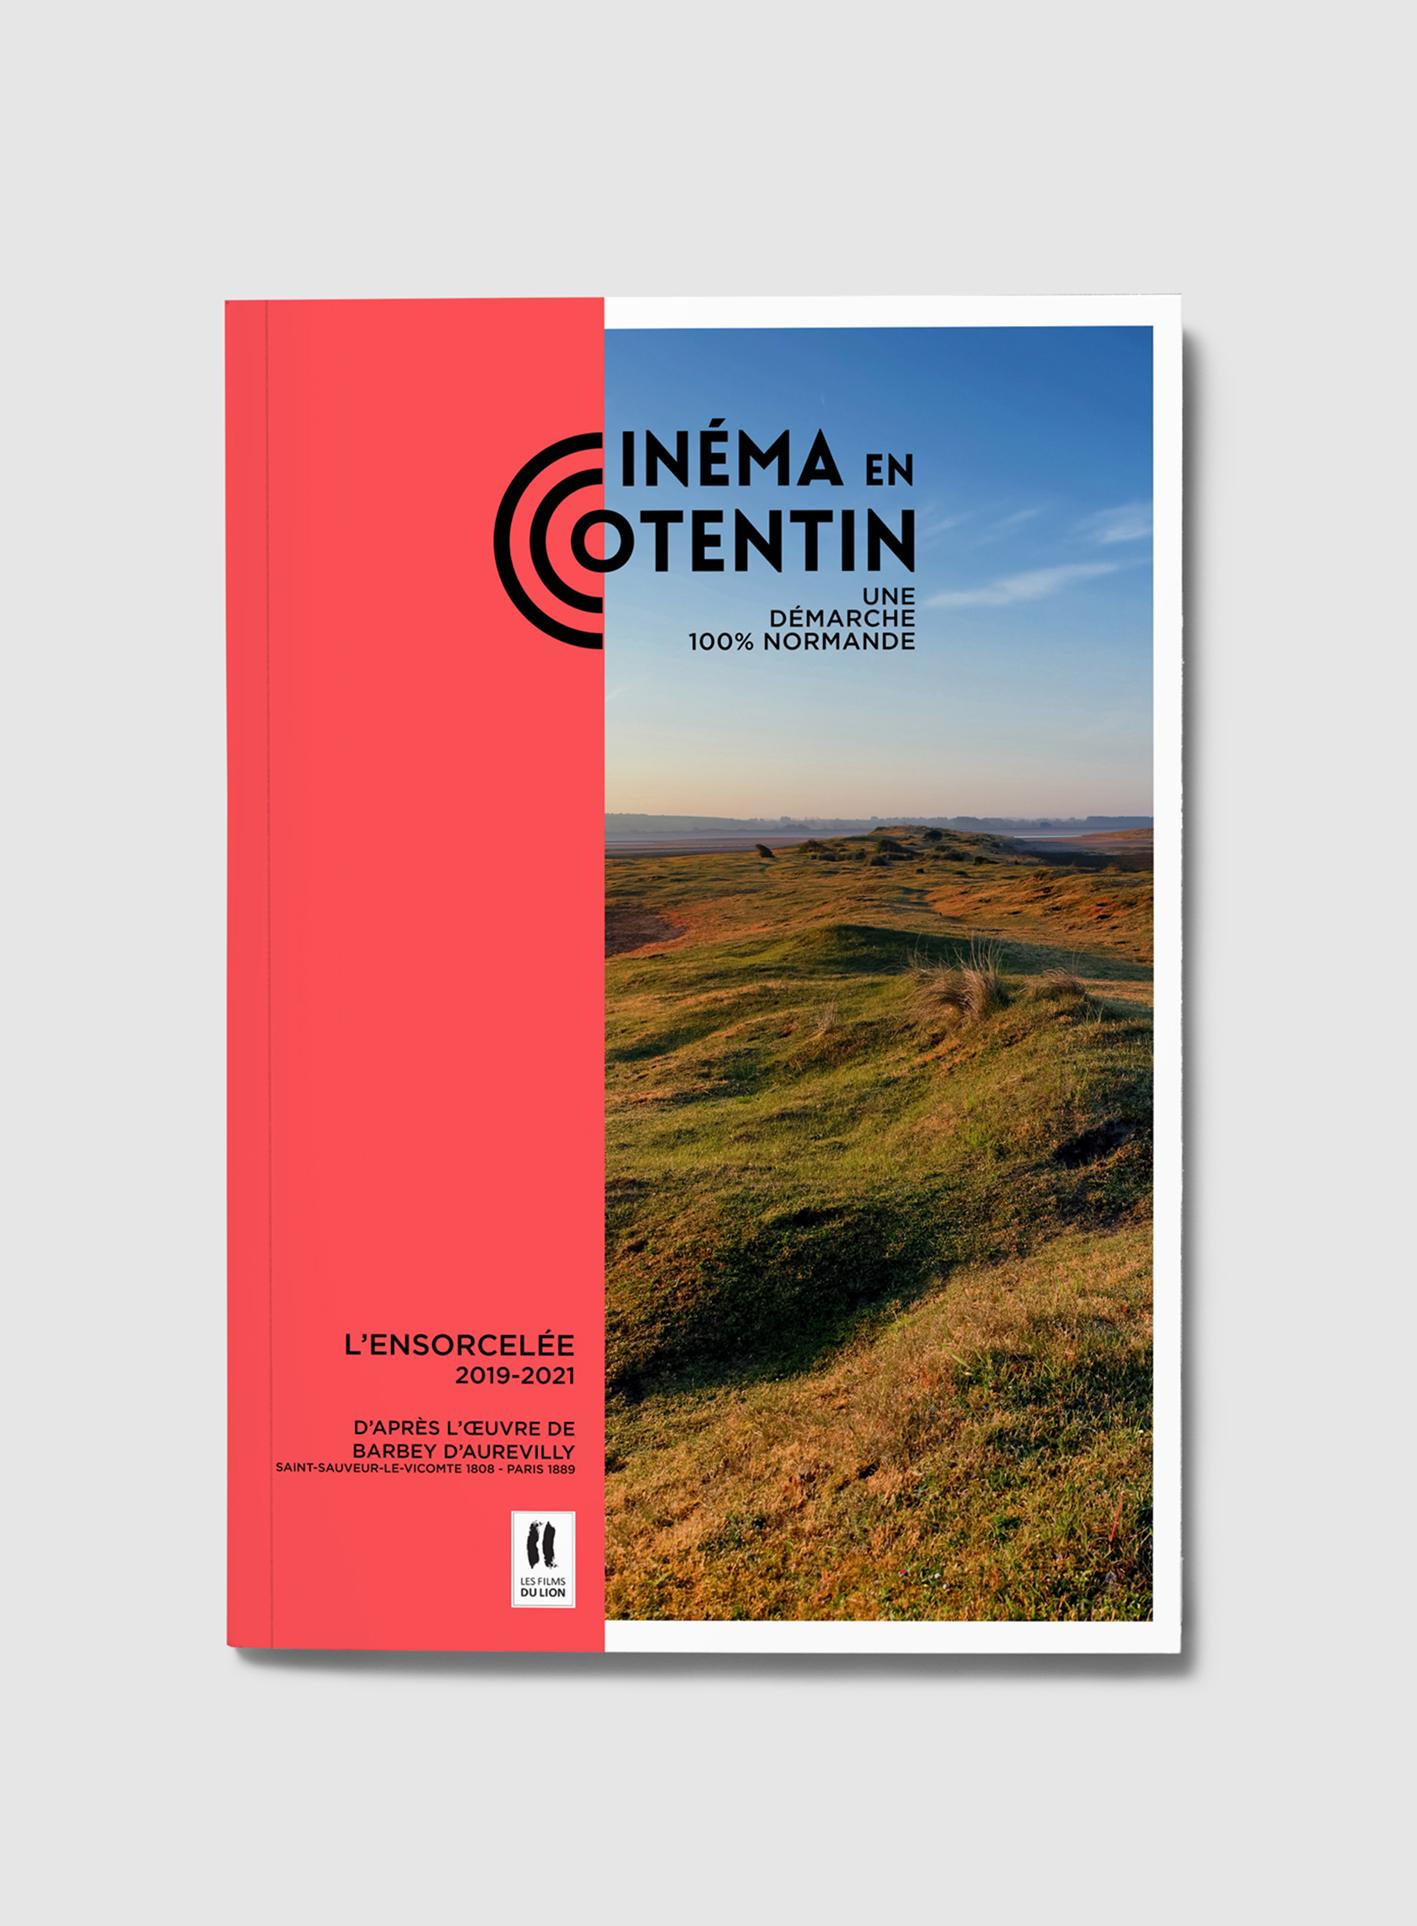 Branding Cinema en Cotentin